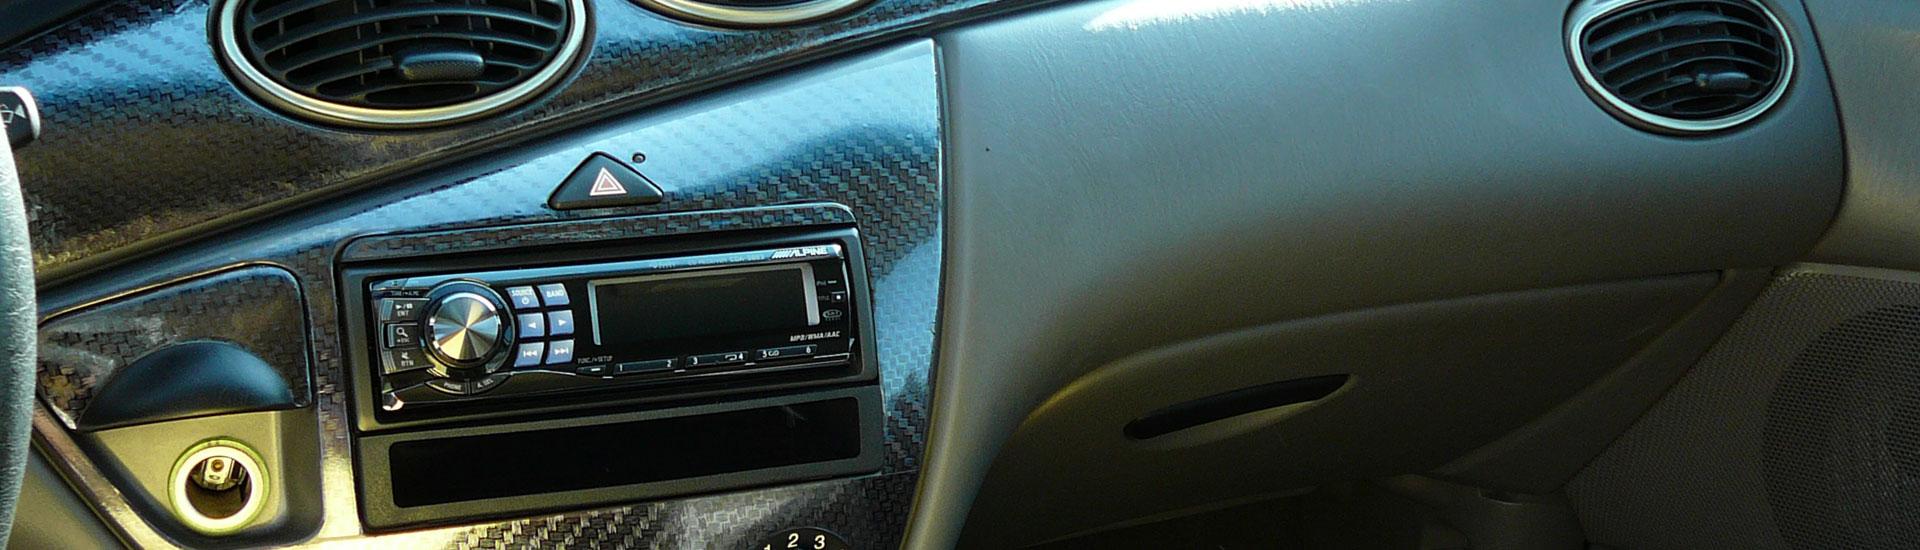 Ford focus custom dash kits